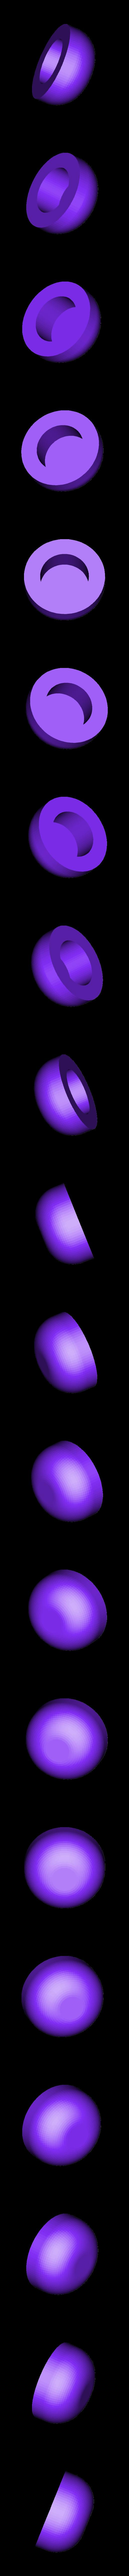 gemstone_x8_v1.stl Download free STL file Simple crown • 3D printable model, poblocki1982